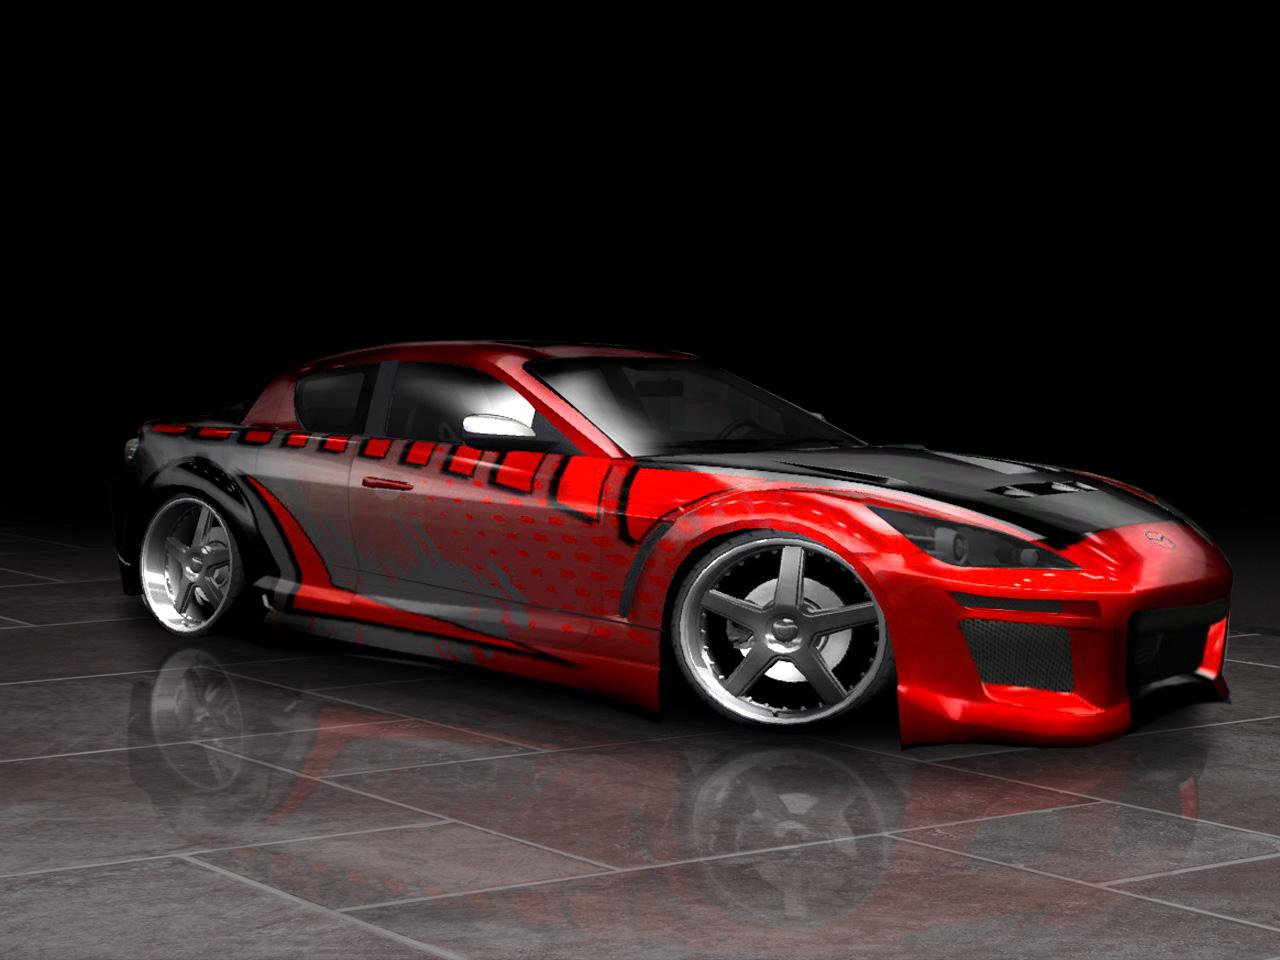 Mazda 3 2017 Custom >> Custom NFSC rx8 by angelix000000 on DeviantArt